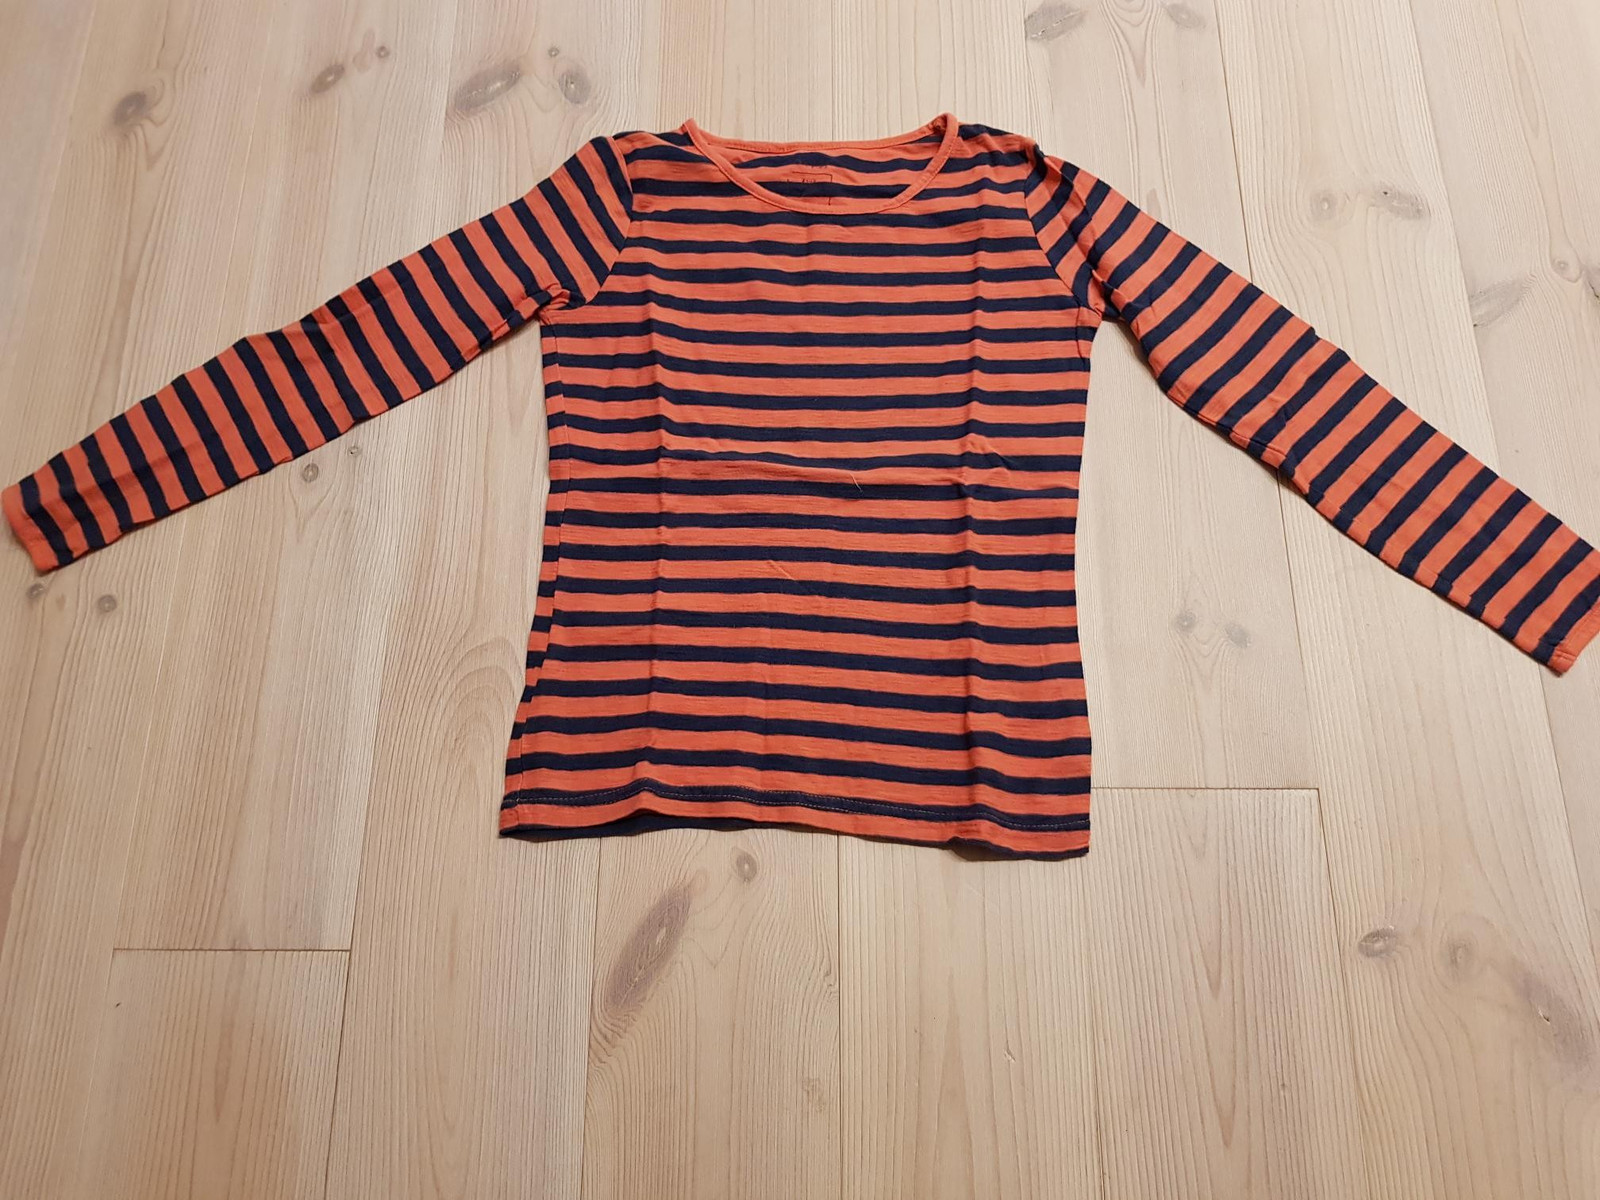 c21af59f Pene kjoler str. 134-140, Noa Noa, Desigual, Zara | FINN.no